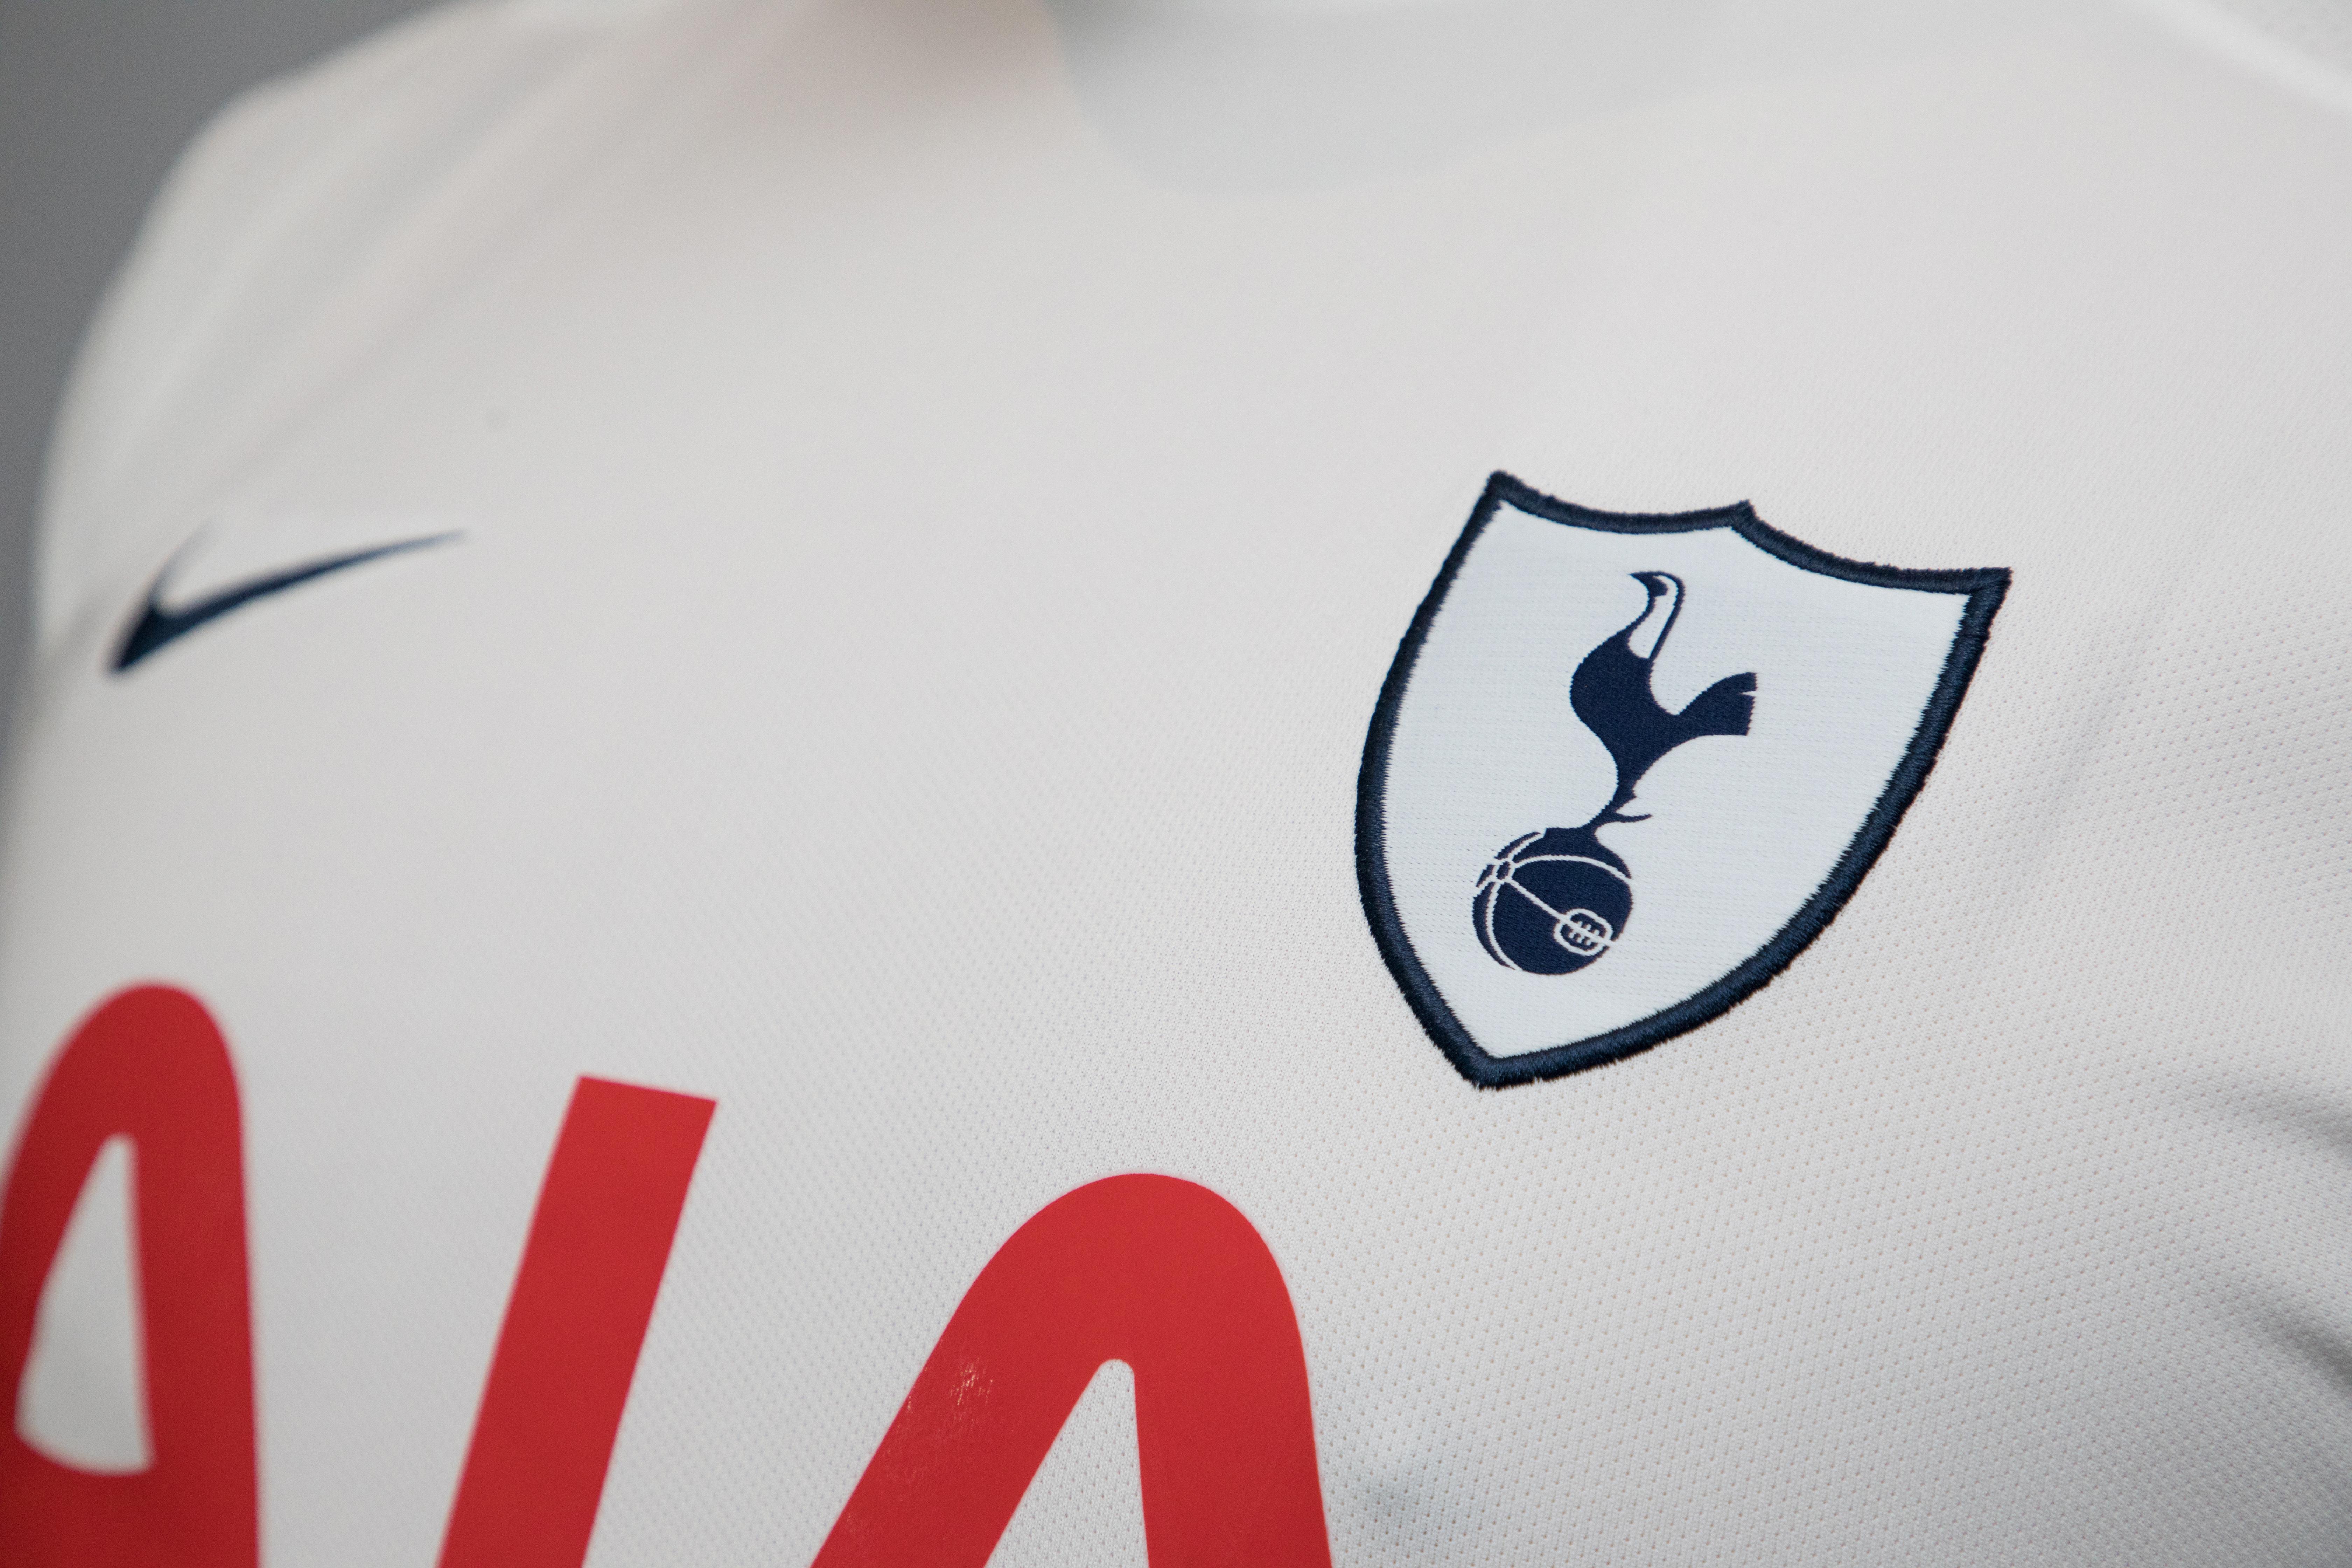 Tottenham Jersey logo